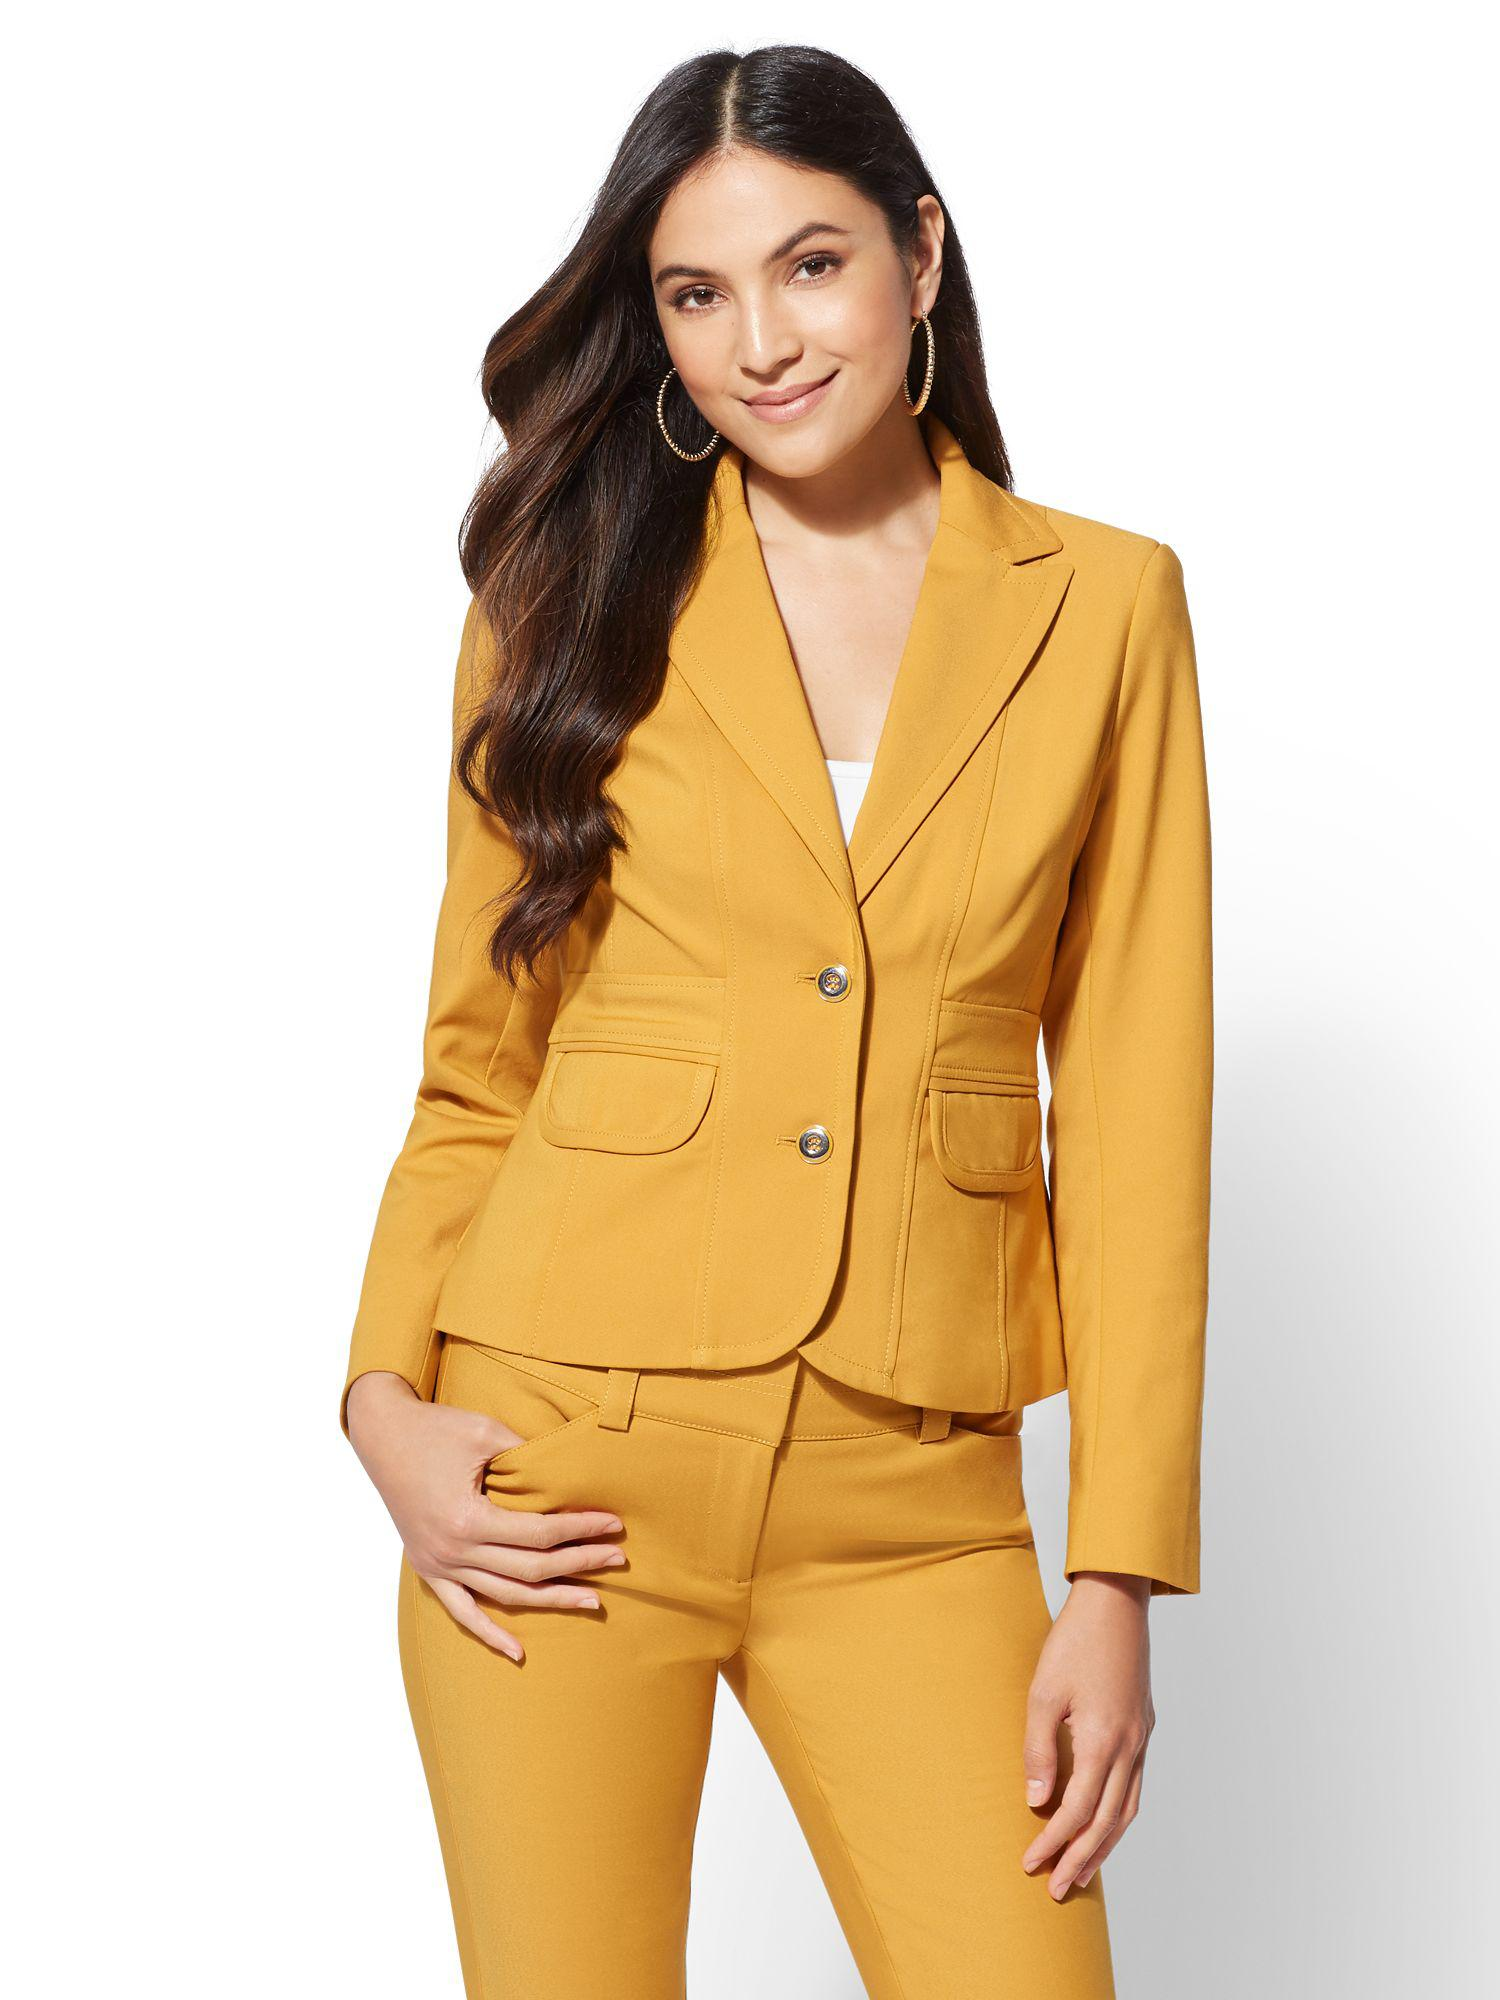 703fe5f50b29 New York & Company. Women's Metallic 7th Avenue - Petite Two-button Jacket  - All-season Stretch